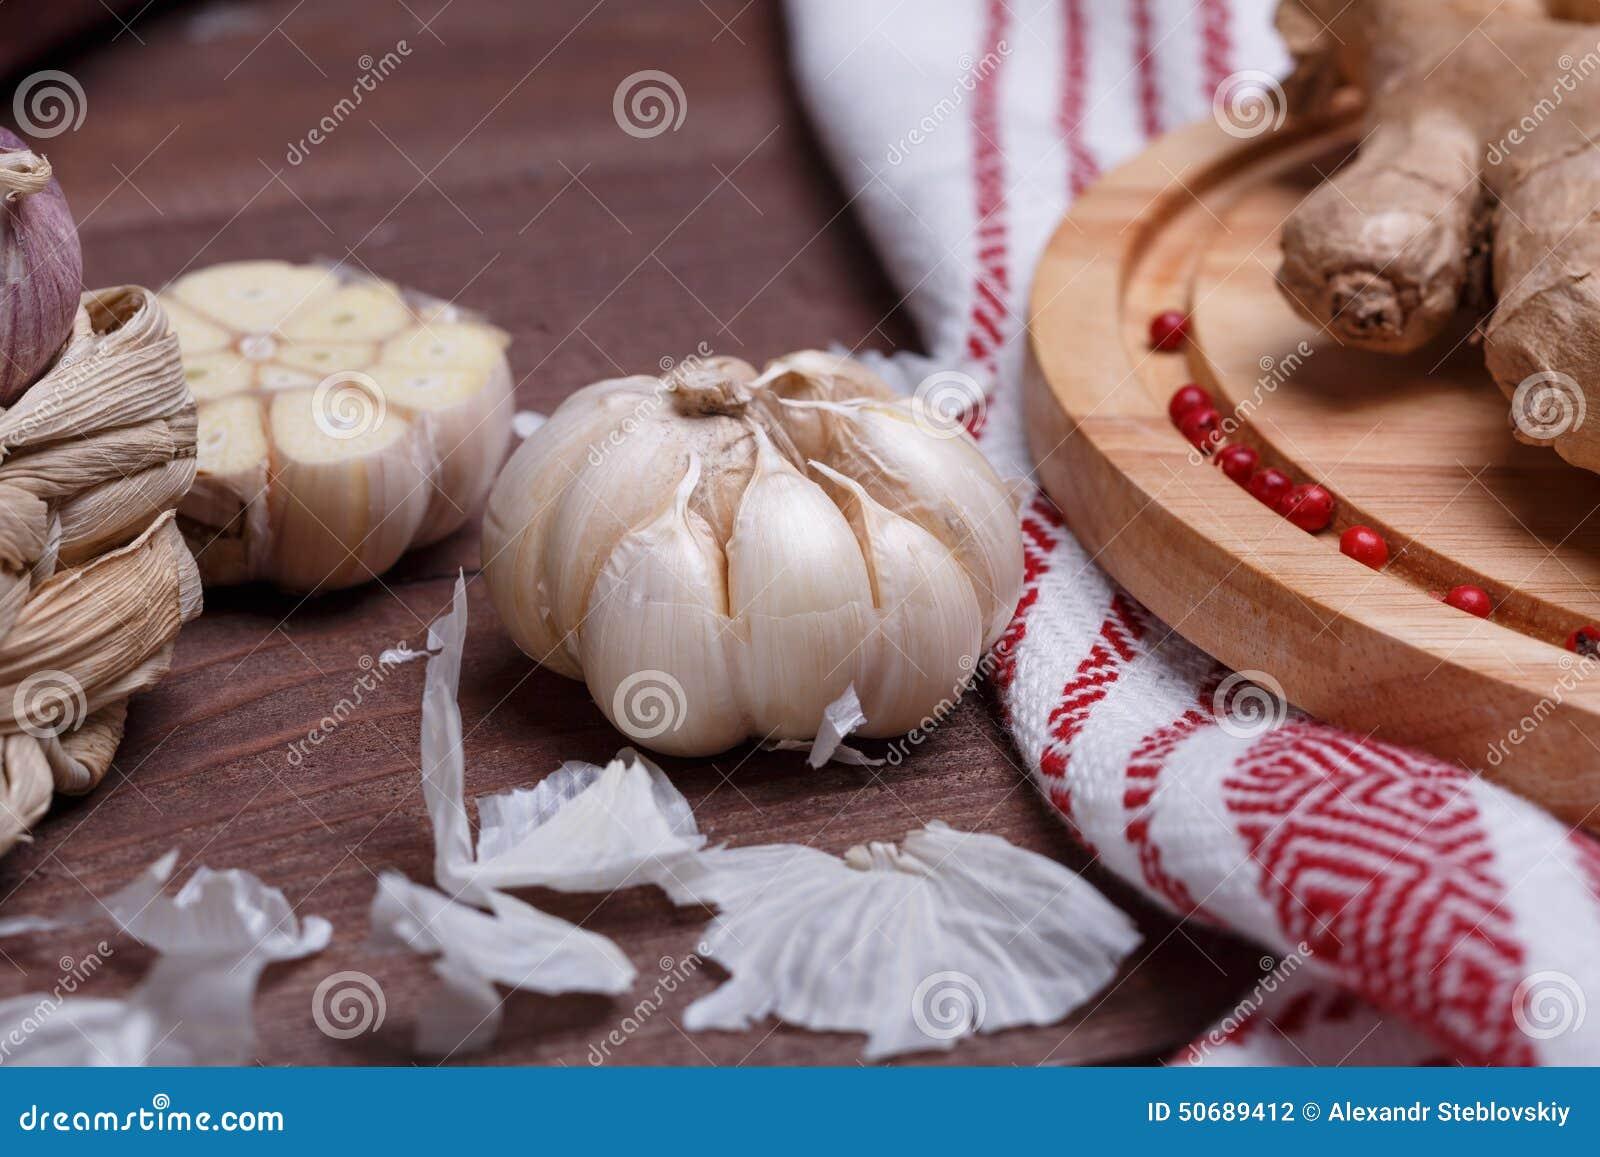 Download 在书桌上的新鲜的香料 库存照片. 图片 包括有 农夫, 厨房, 生气勃勃, 剪切, 直接地, 本质, 上色 - 50689412